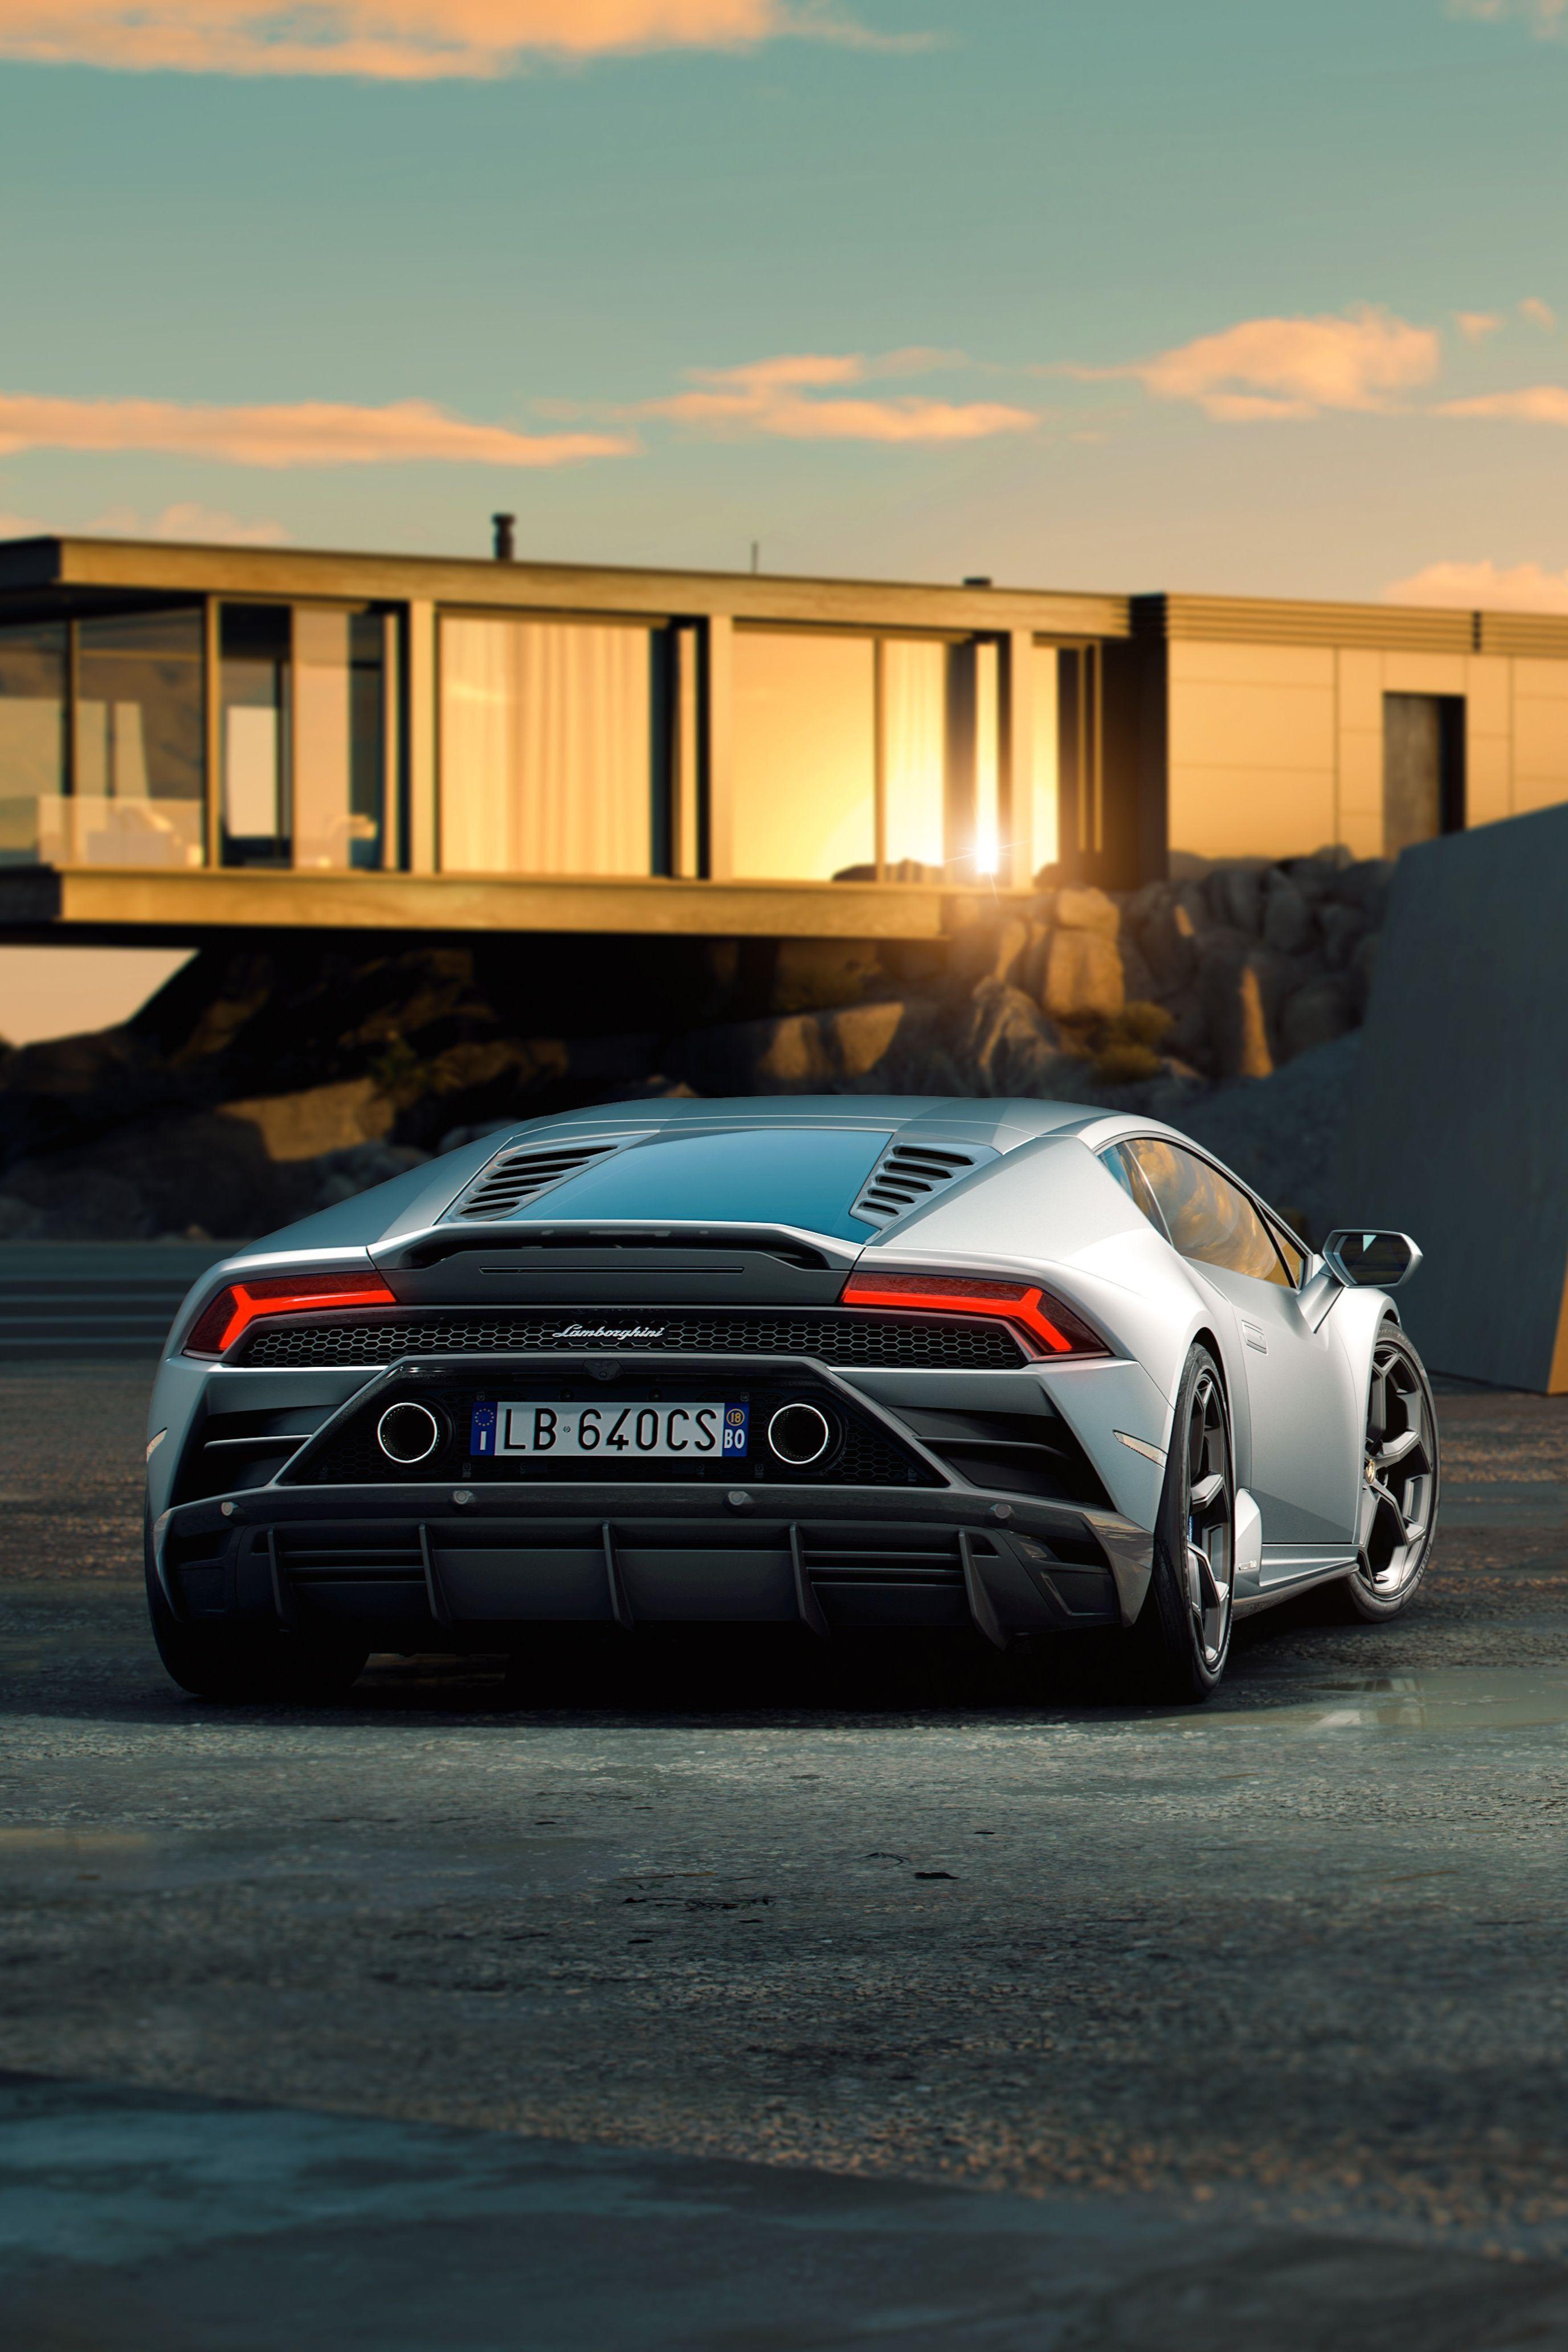 2019 Lamborghini Huracán Evo #lamborghinihuracan 2019 Lamborghini Huracán Evo - The MAN  #Lamborgini #Huracan #Evo #Hypercar #lamborghinihuracan 2019 Lamborghini Huracán Evo #lamborghinihuracan 2019 Lamborghini Huracán Evo - The MAN  #Lamborgini #Huracan #Evo #Hypercar #lamborghinihuracan